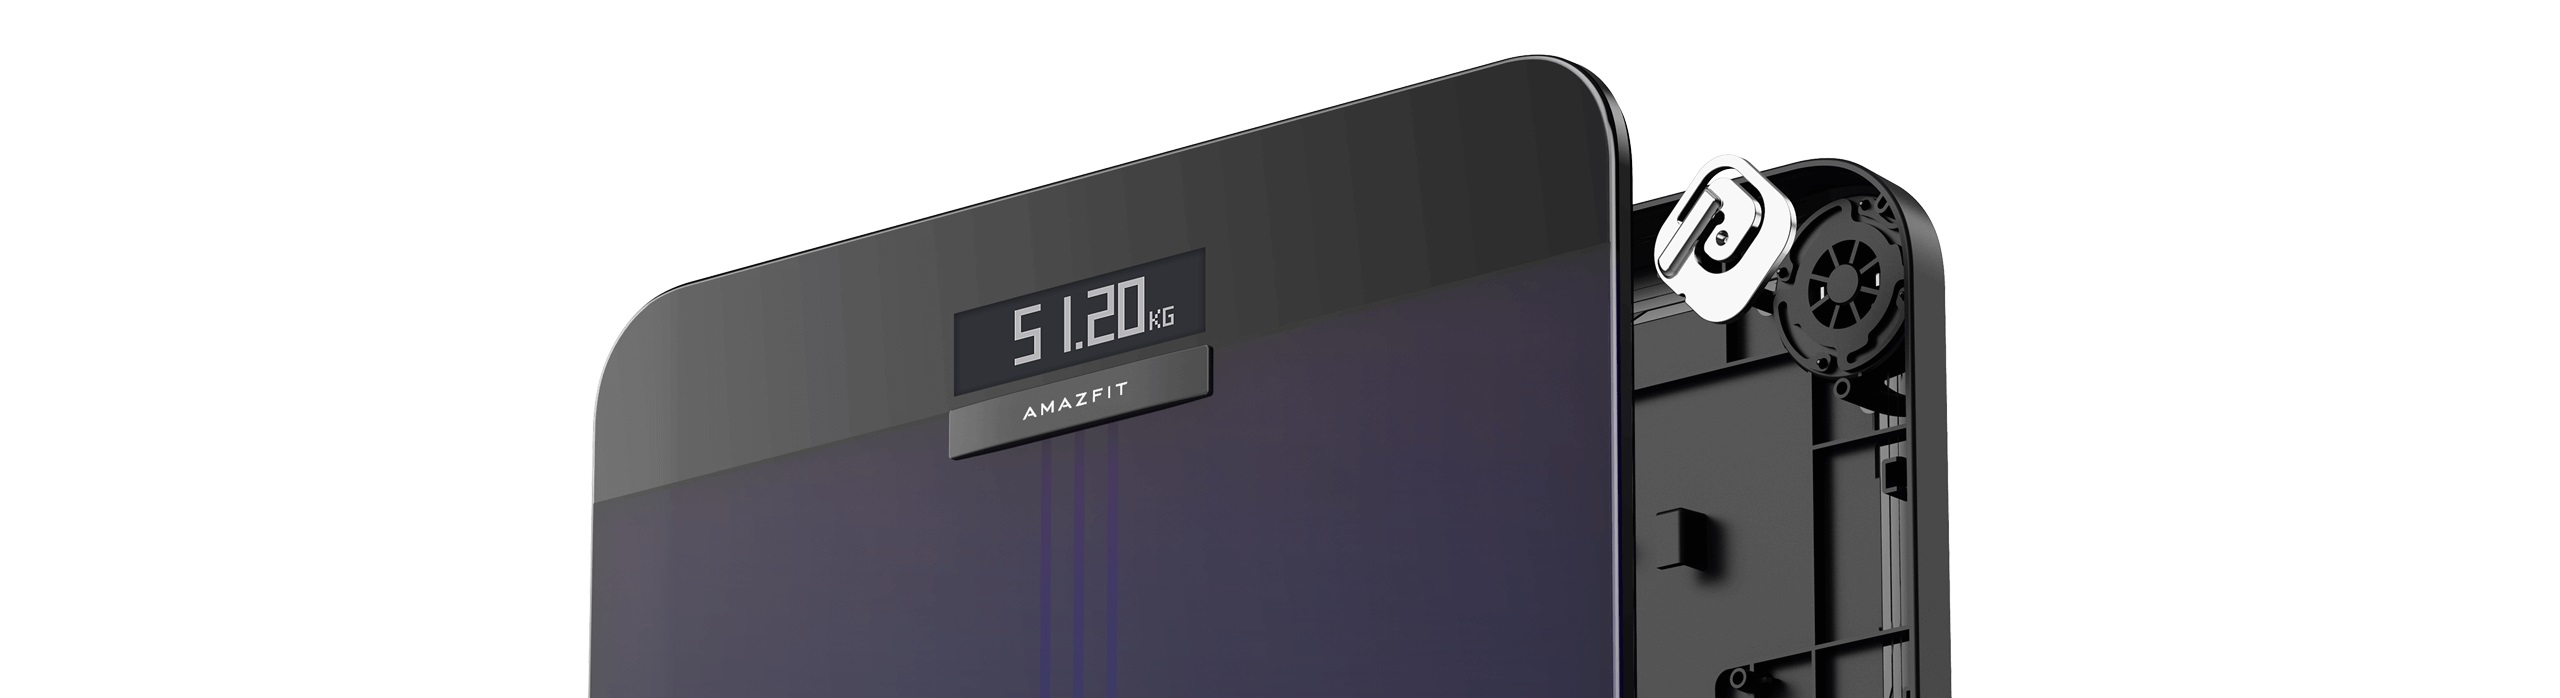 inteligentna waga Amazfit Smart Scale